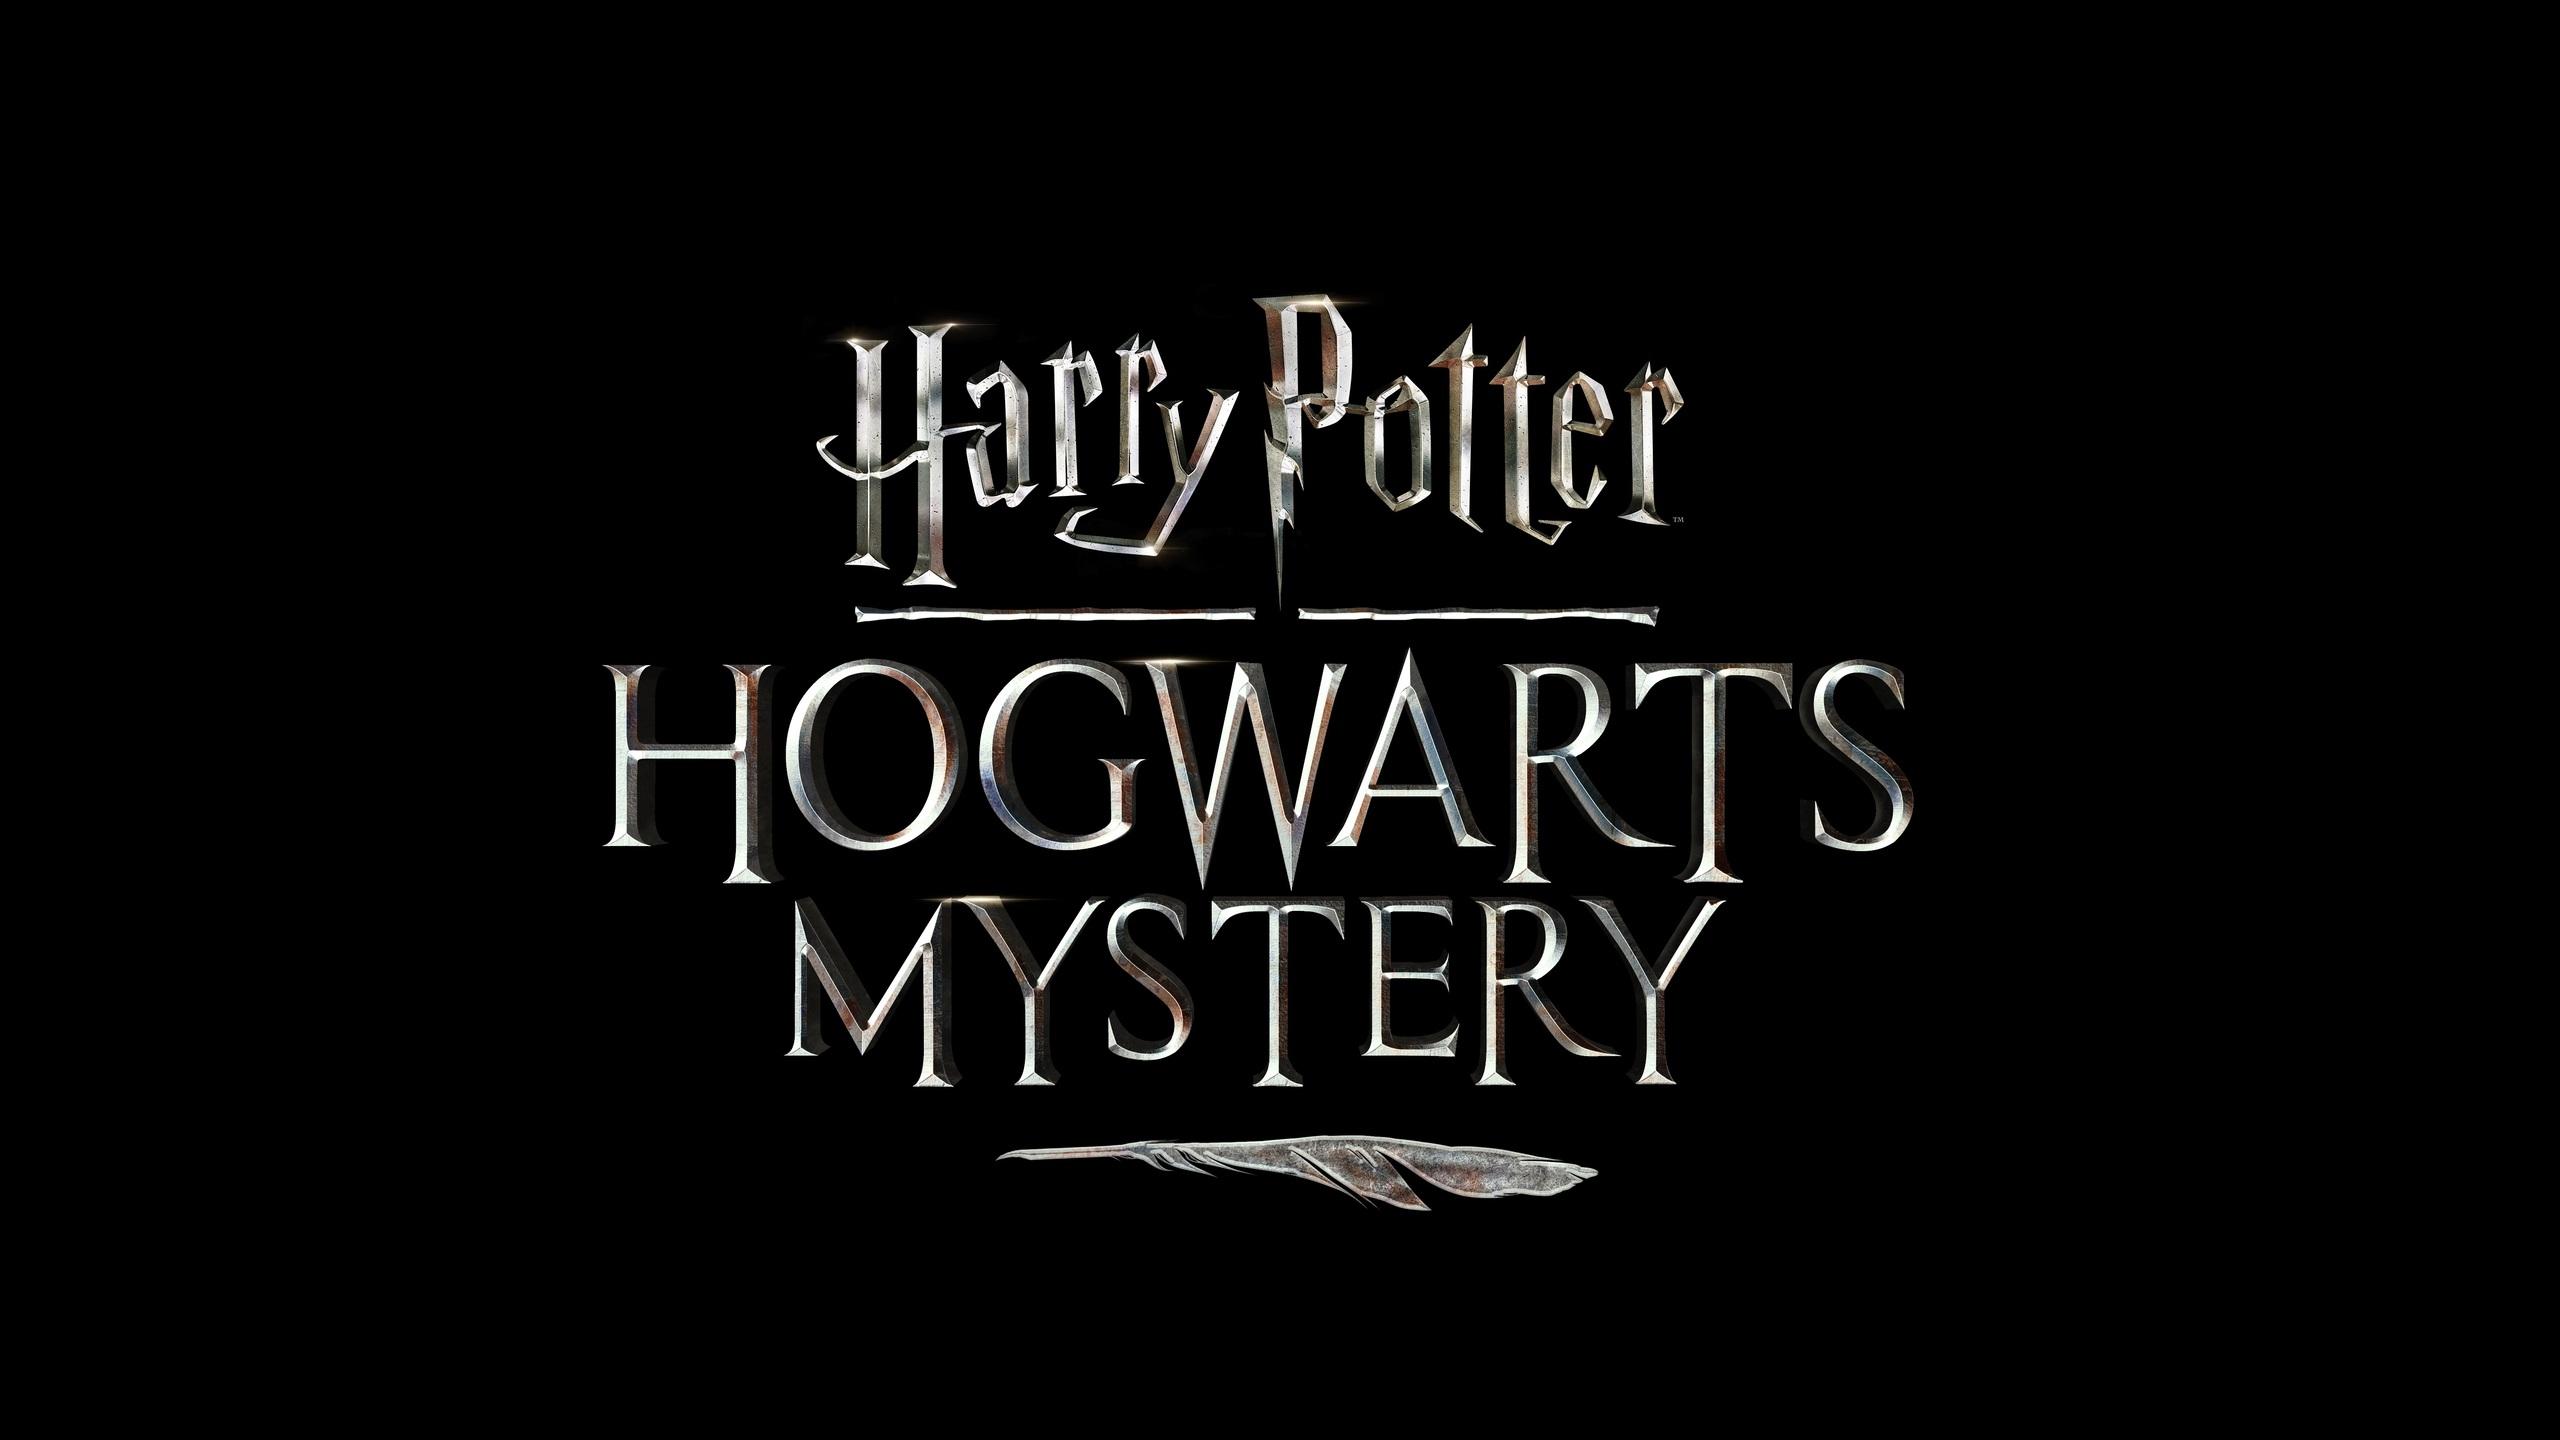 2560x1440 harry potter hogwarts mystery game logo 1440p